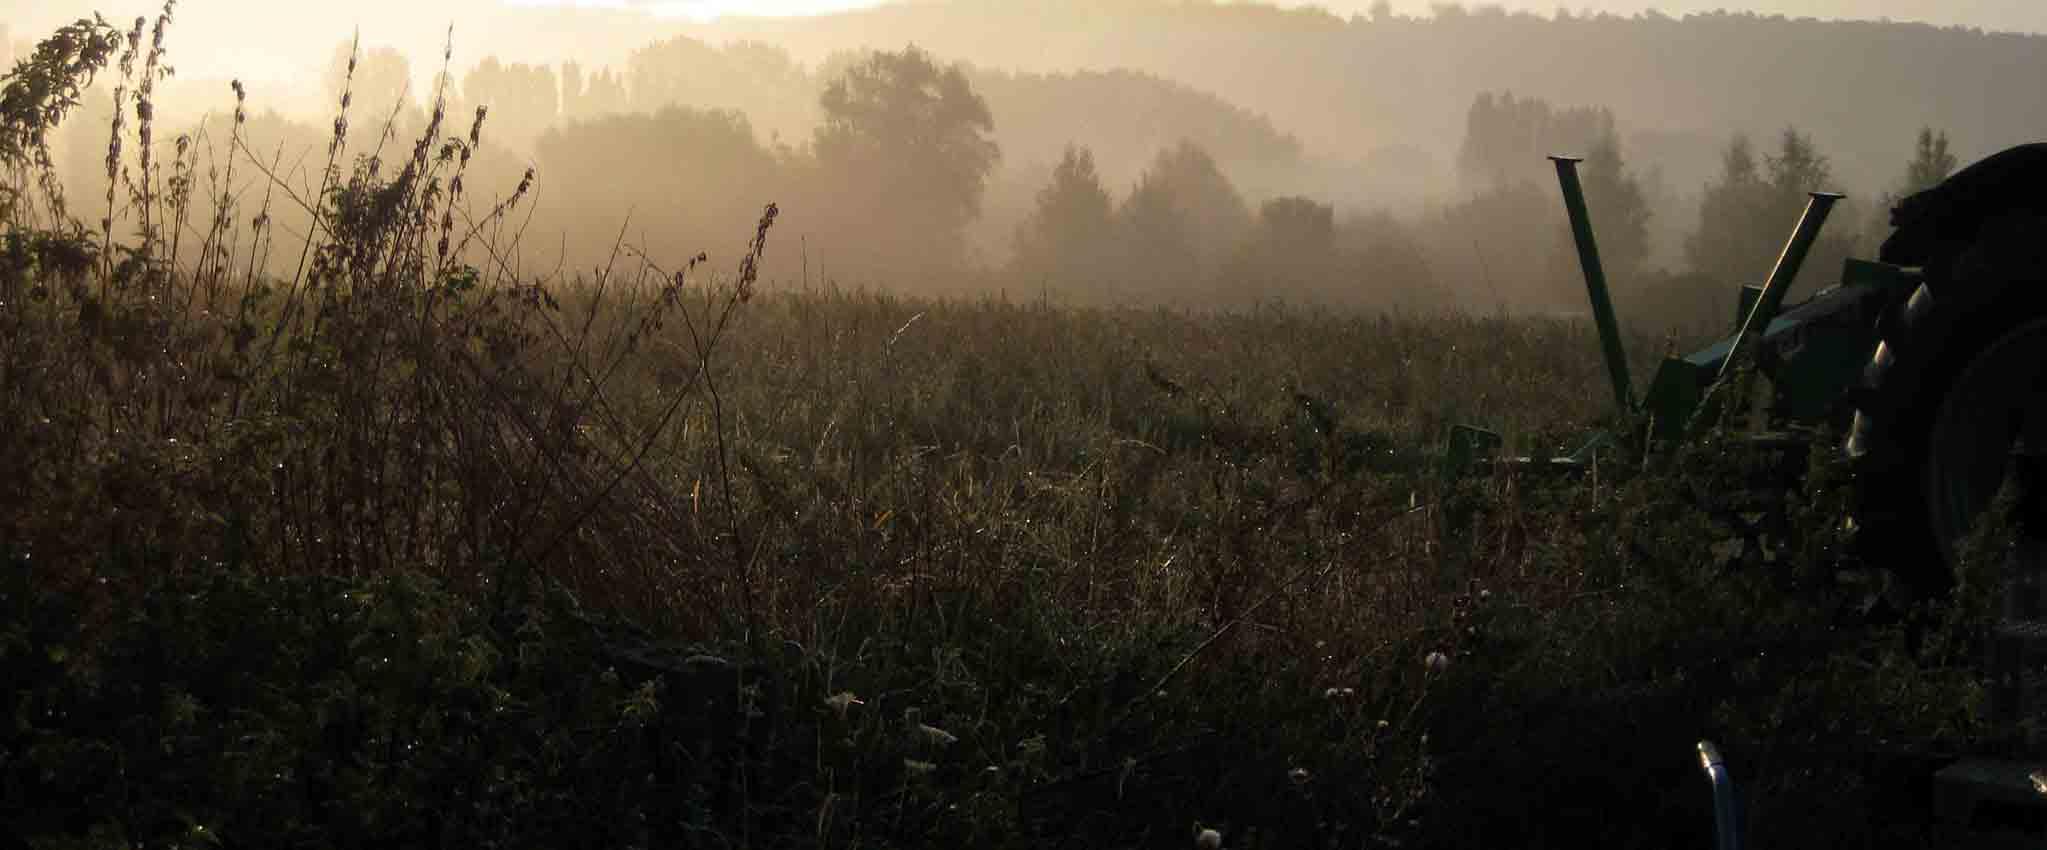 renard-maraicher-biologique-yvelines-78-tracteur-champ2